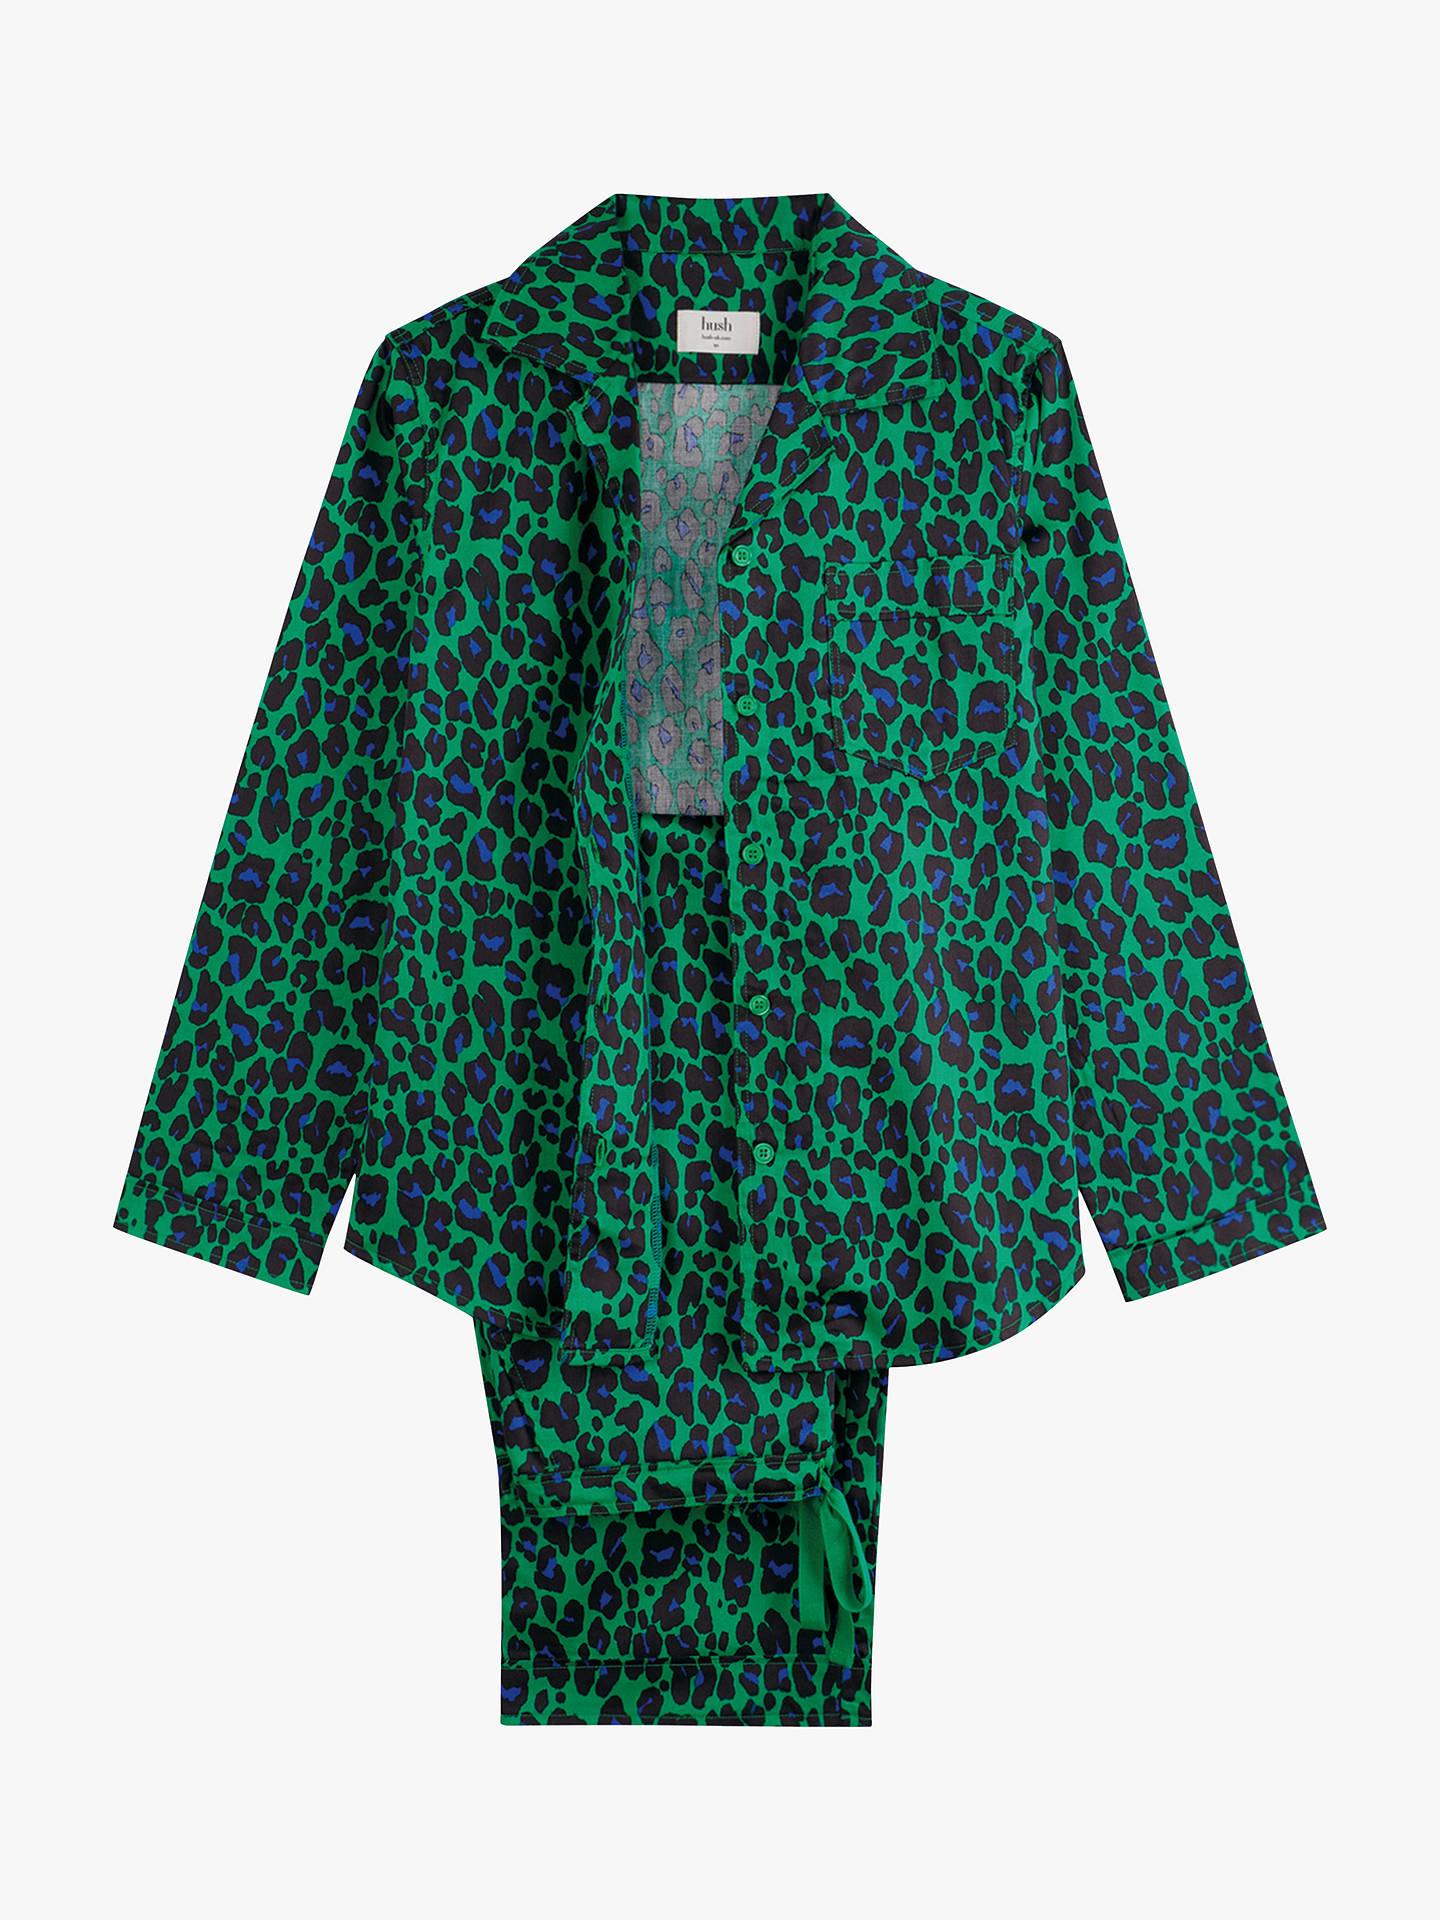 ... Buyhush Bright Leopard Print Cotton Pyjama Set 608745fcd